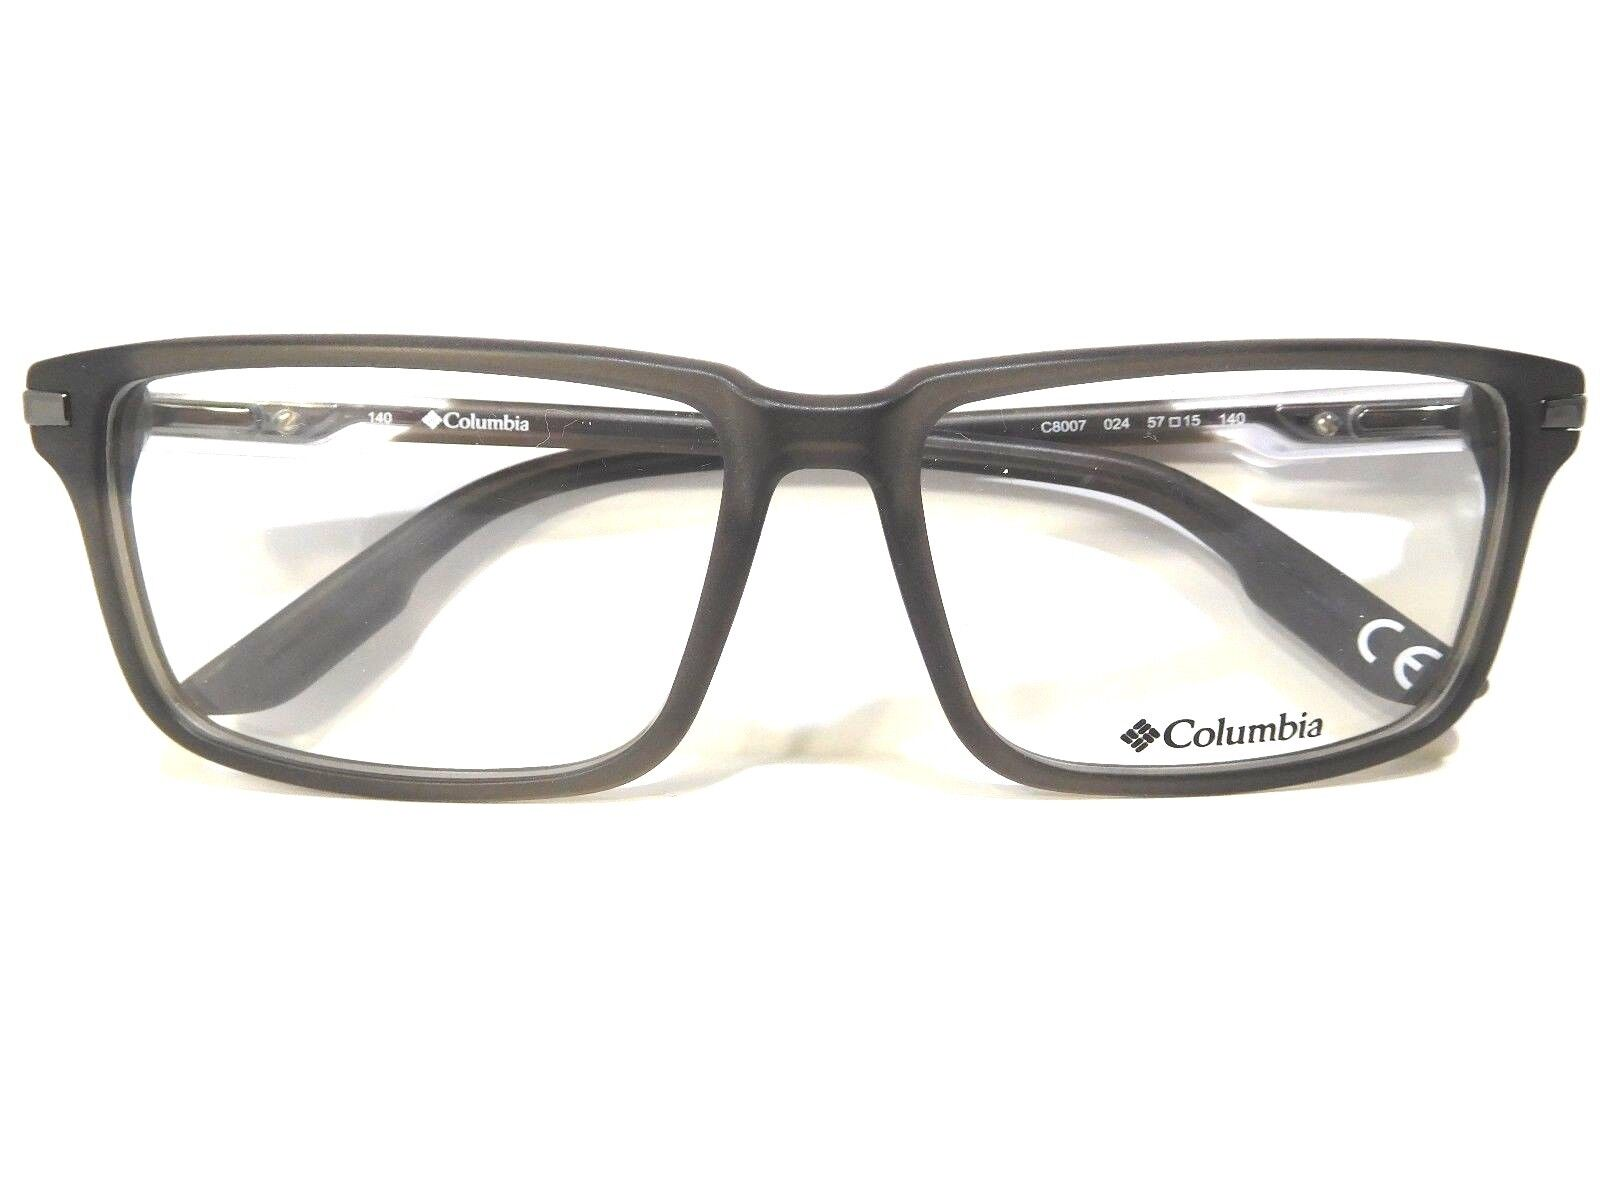 712f5144c8 Columbia C8007 Eyeglasses 039 Grey Horn PERSCRIPTION Glasses